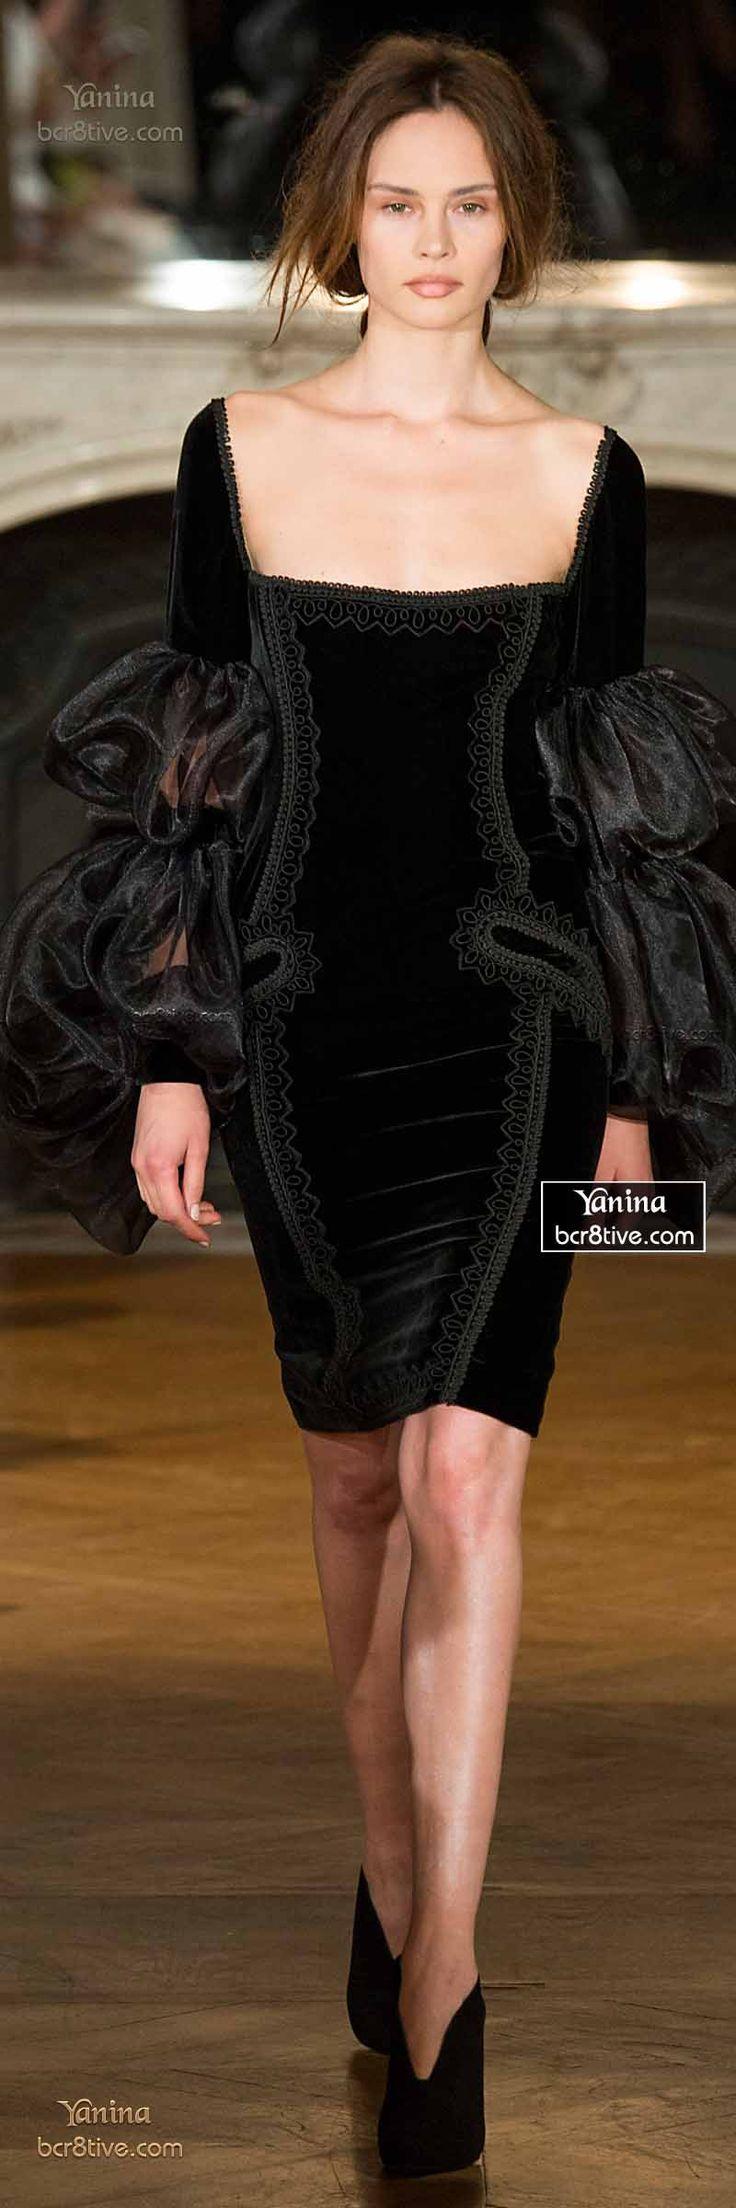 Velvet Touch! Designer Black Dress LBD Fashion Trends Runway Style Yanina Fall 2014-15 Haute Couture